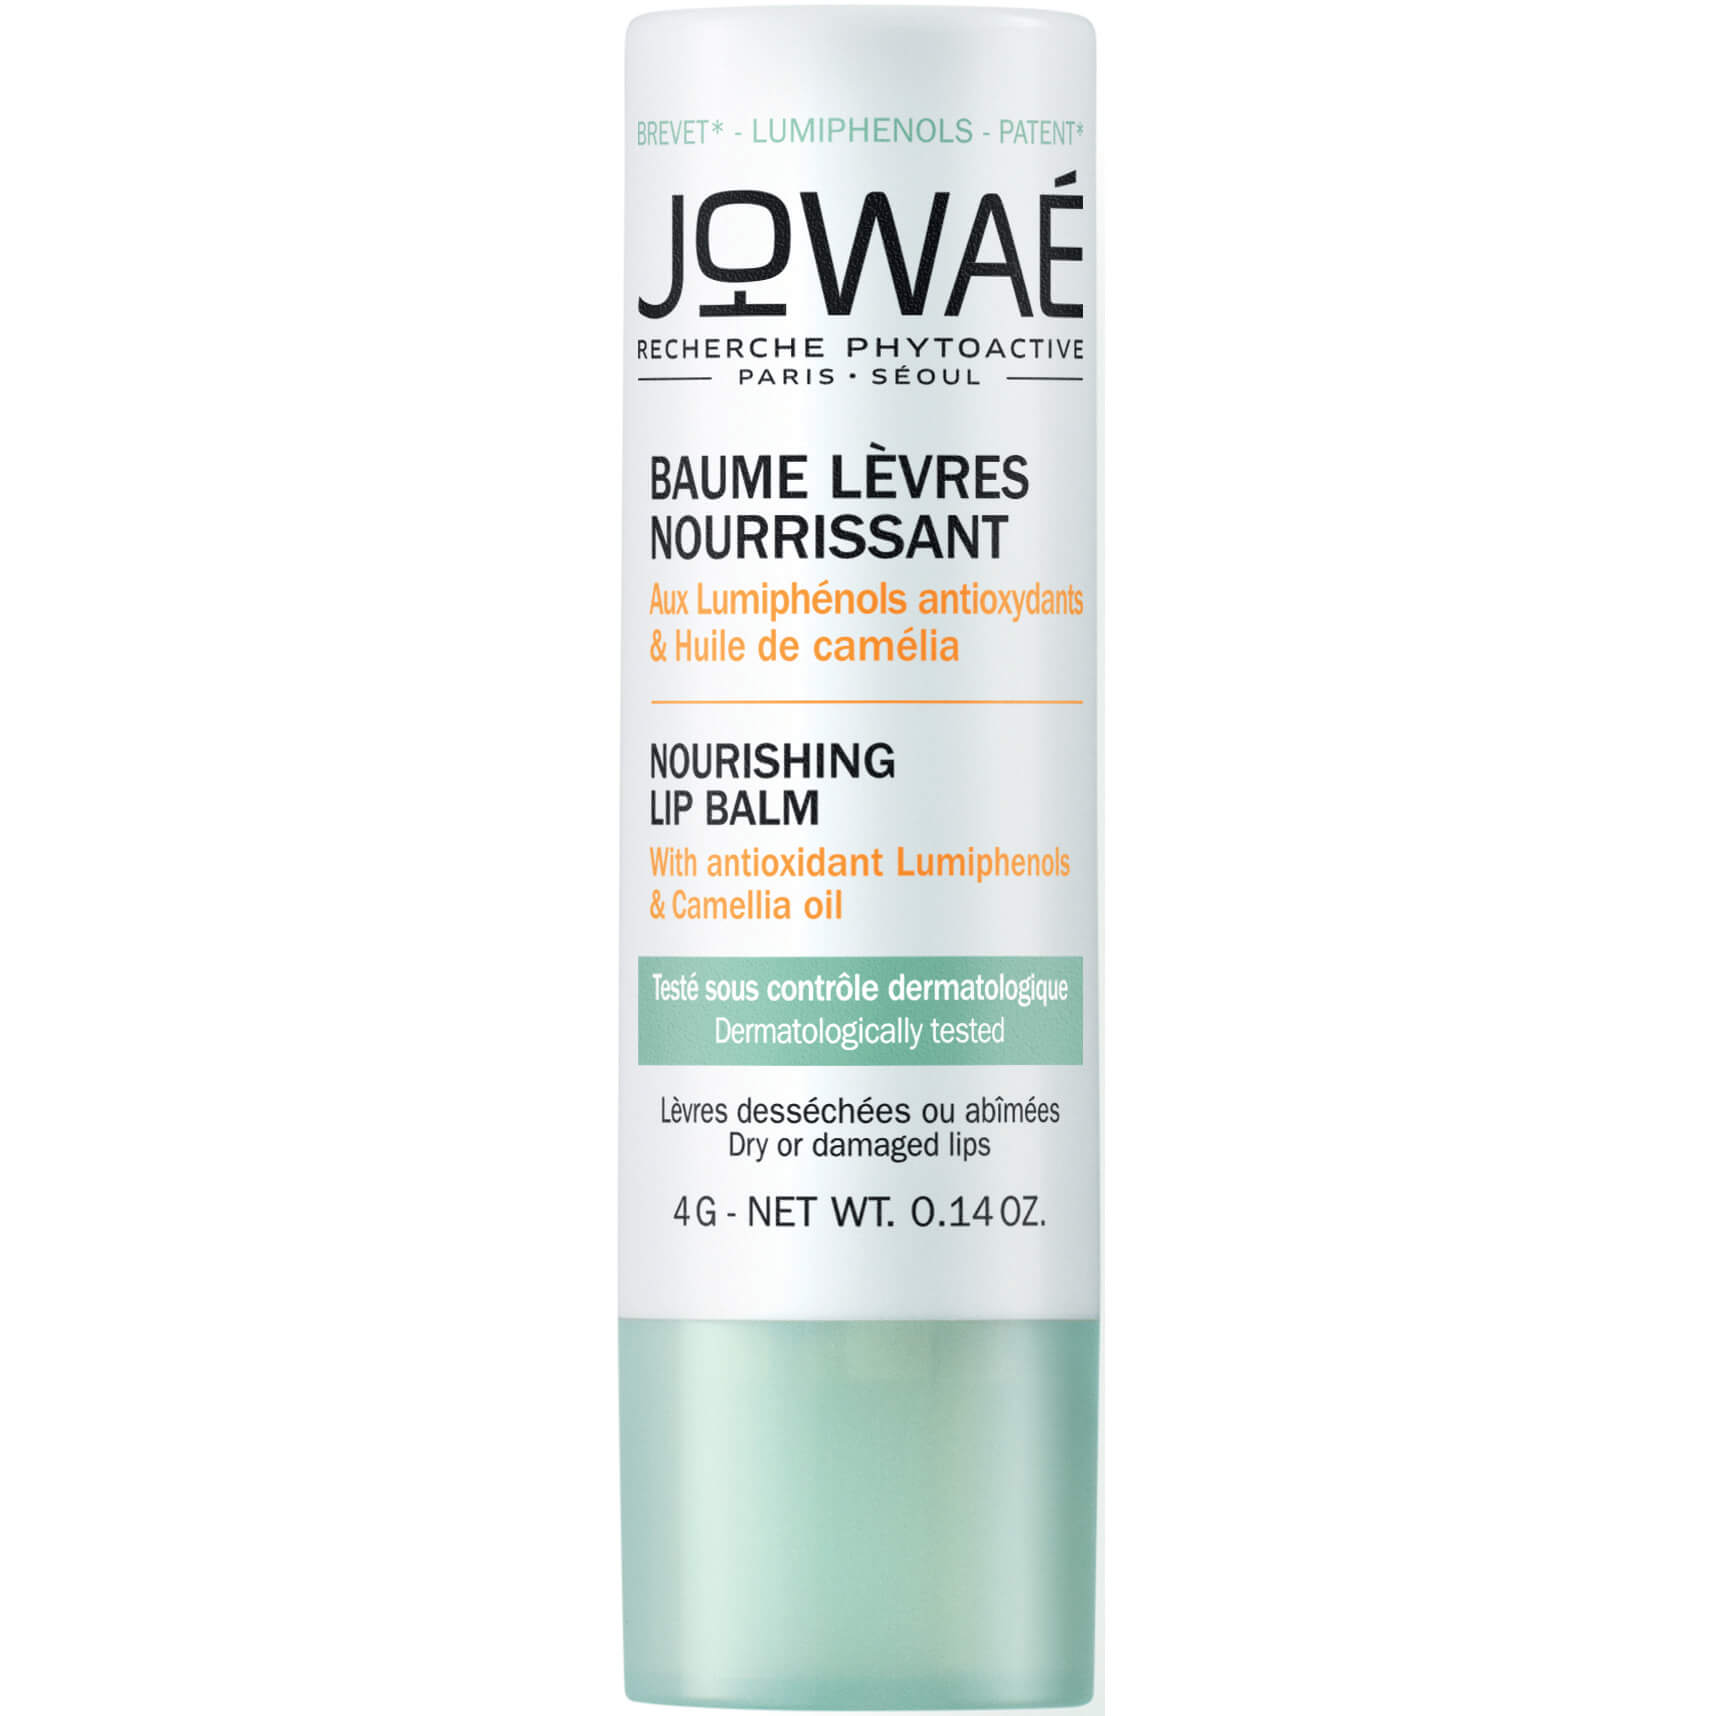 Jowae Nourishing Lip Balm Θρεπτικό Balm Χειλιών Φροντίδα για Ξηρά ή Ταλαιπωρημένα Χείλη 4g